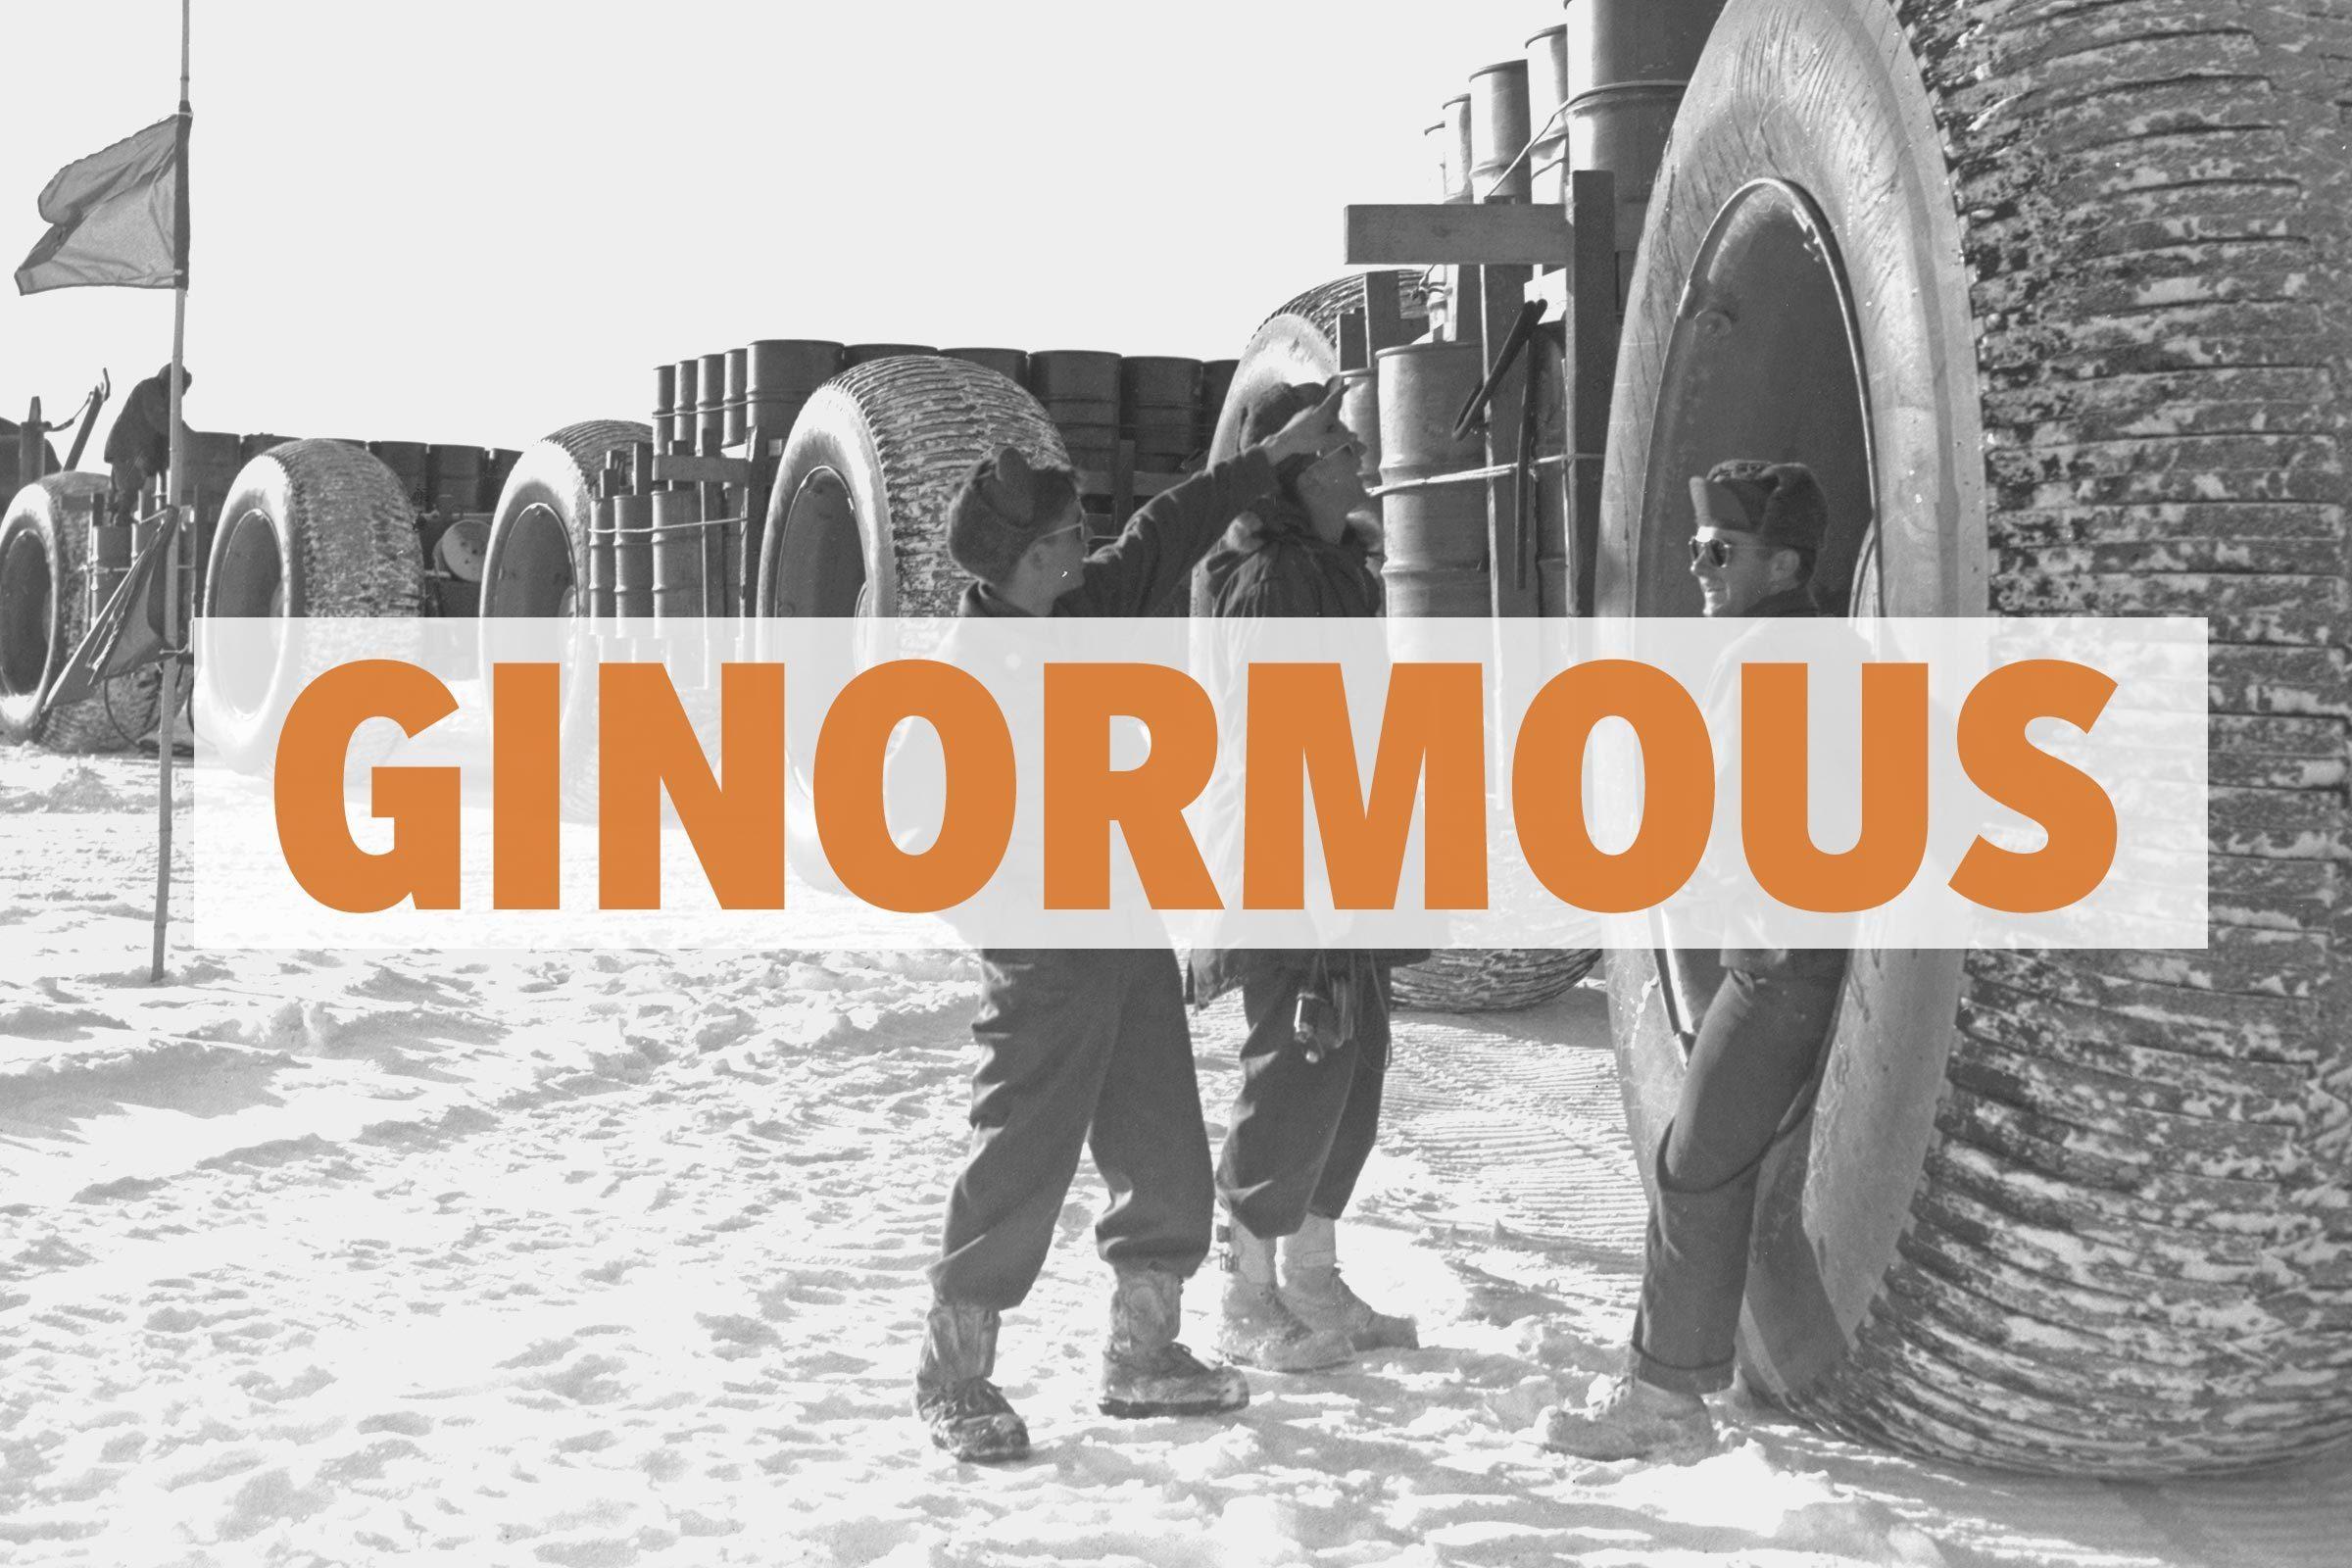 Ginormous